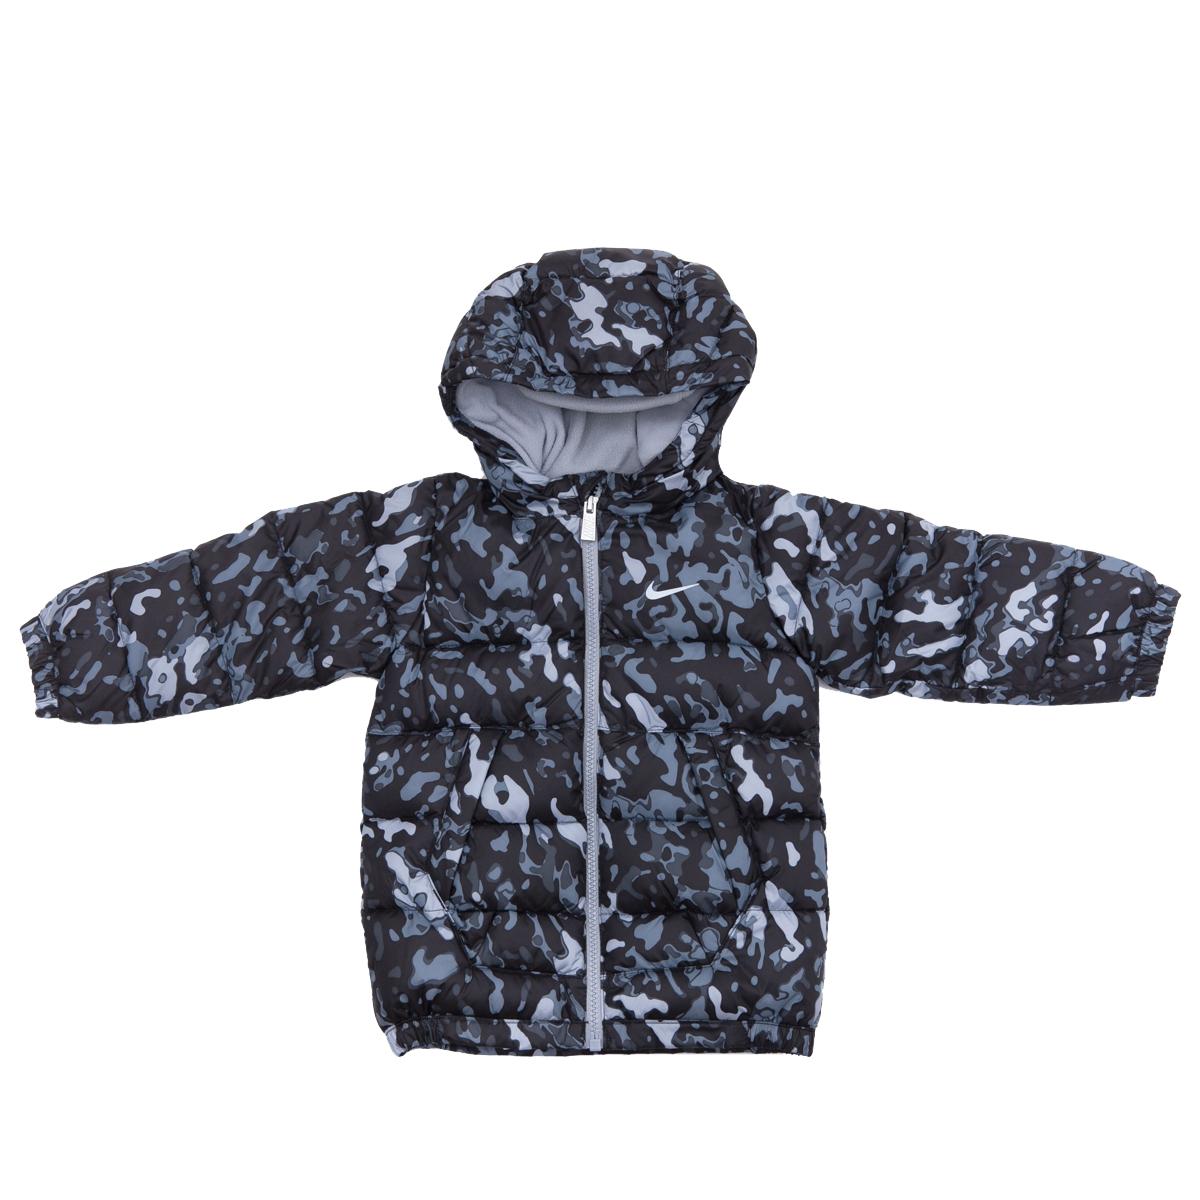 d7baf08b59 Παιδικά   Βρέφη   Ρούχα   Πανωφόρια   MONNALISA - Βρεφικό σακάκι MONNALISA  μπλε - GoldenShopping.gr